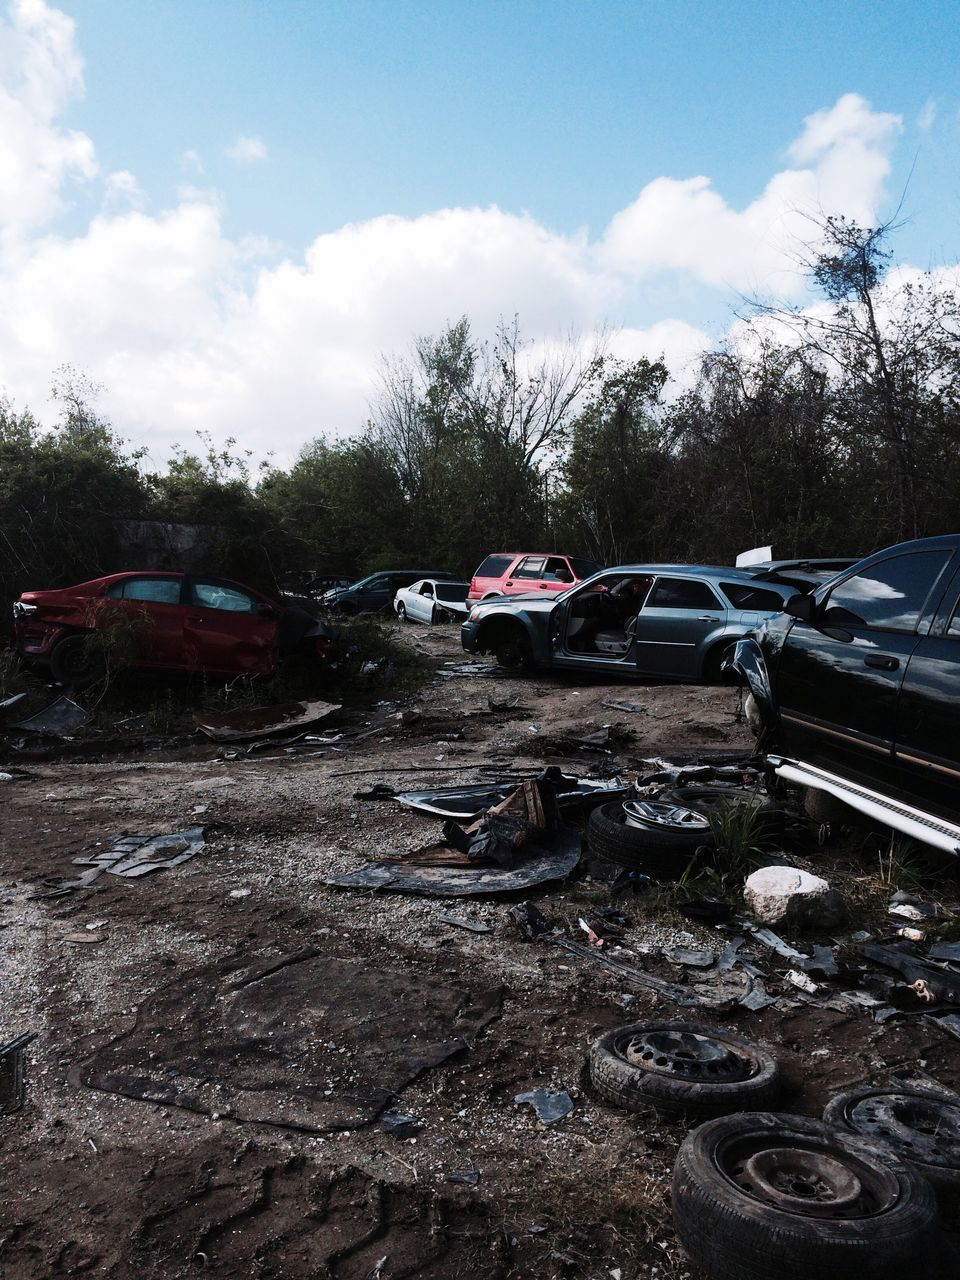 car, abandoned, destruction, damaged, obsolete, garbage, desolate, no people, sky, cloud - sky, bad condition, day, outdoors, bleak, tornado